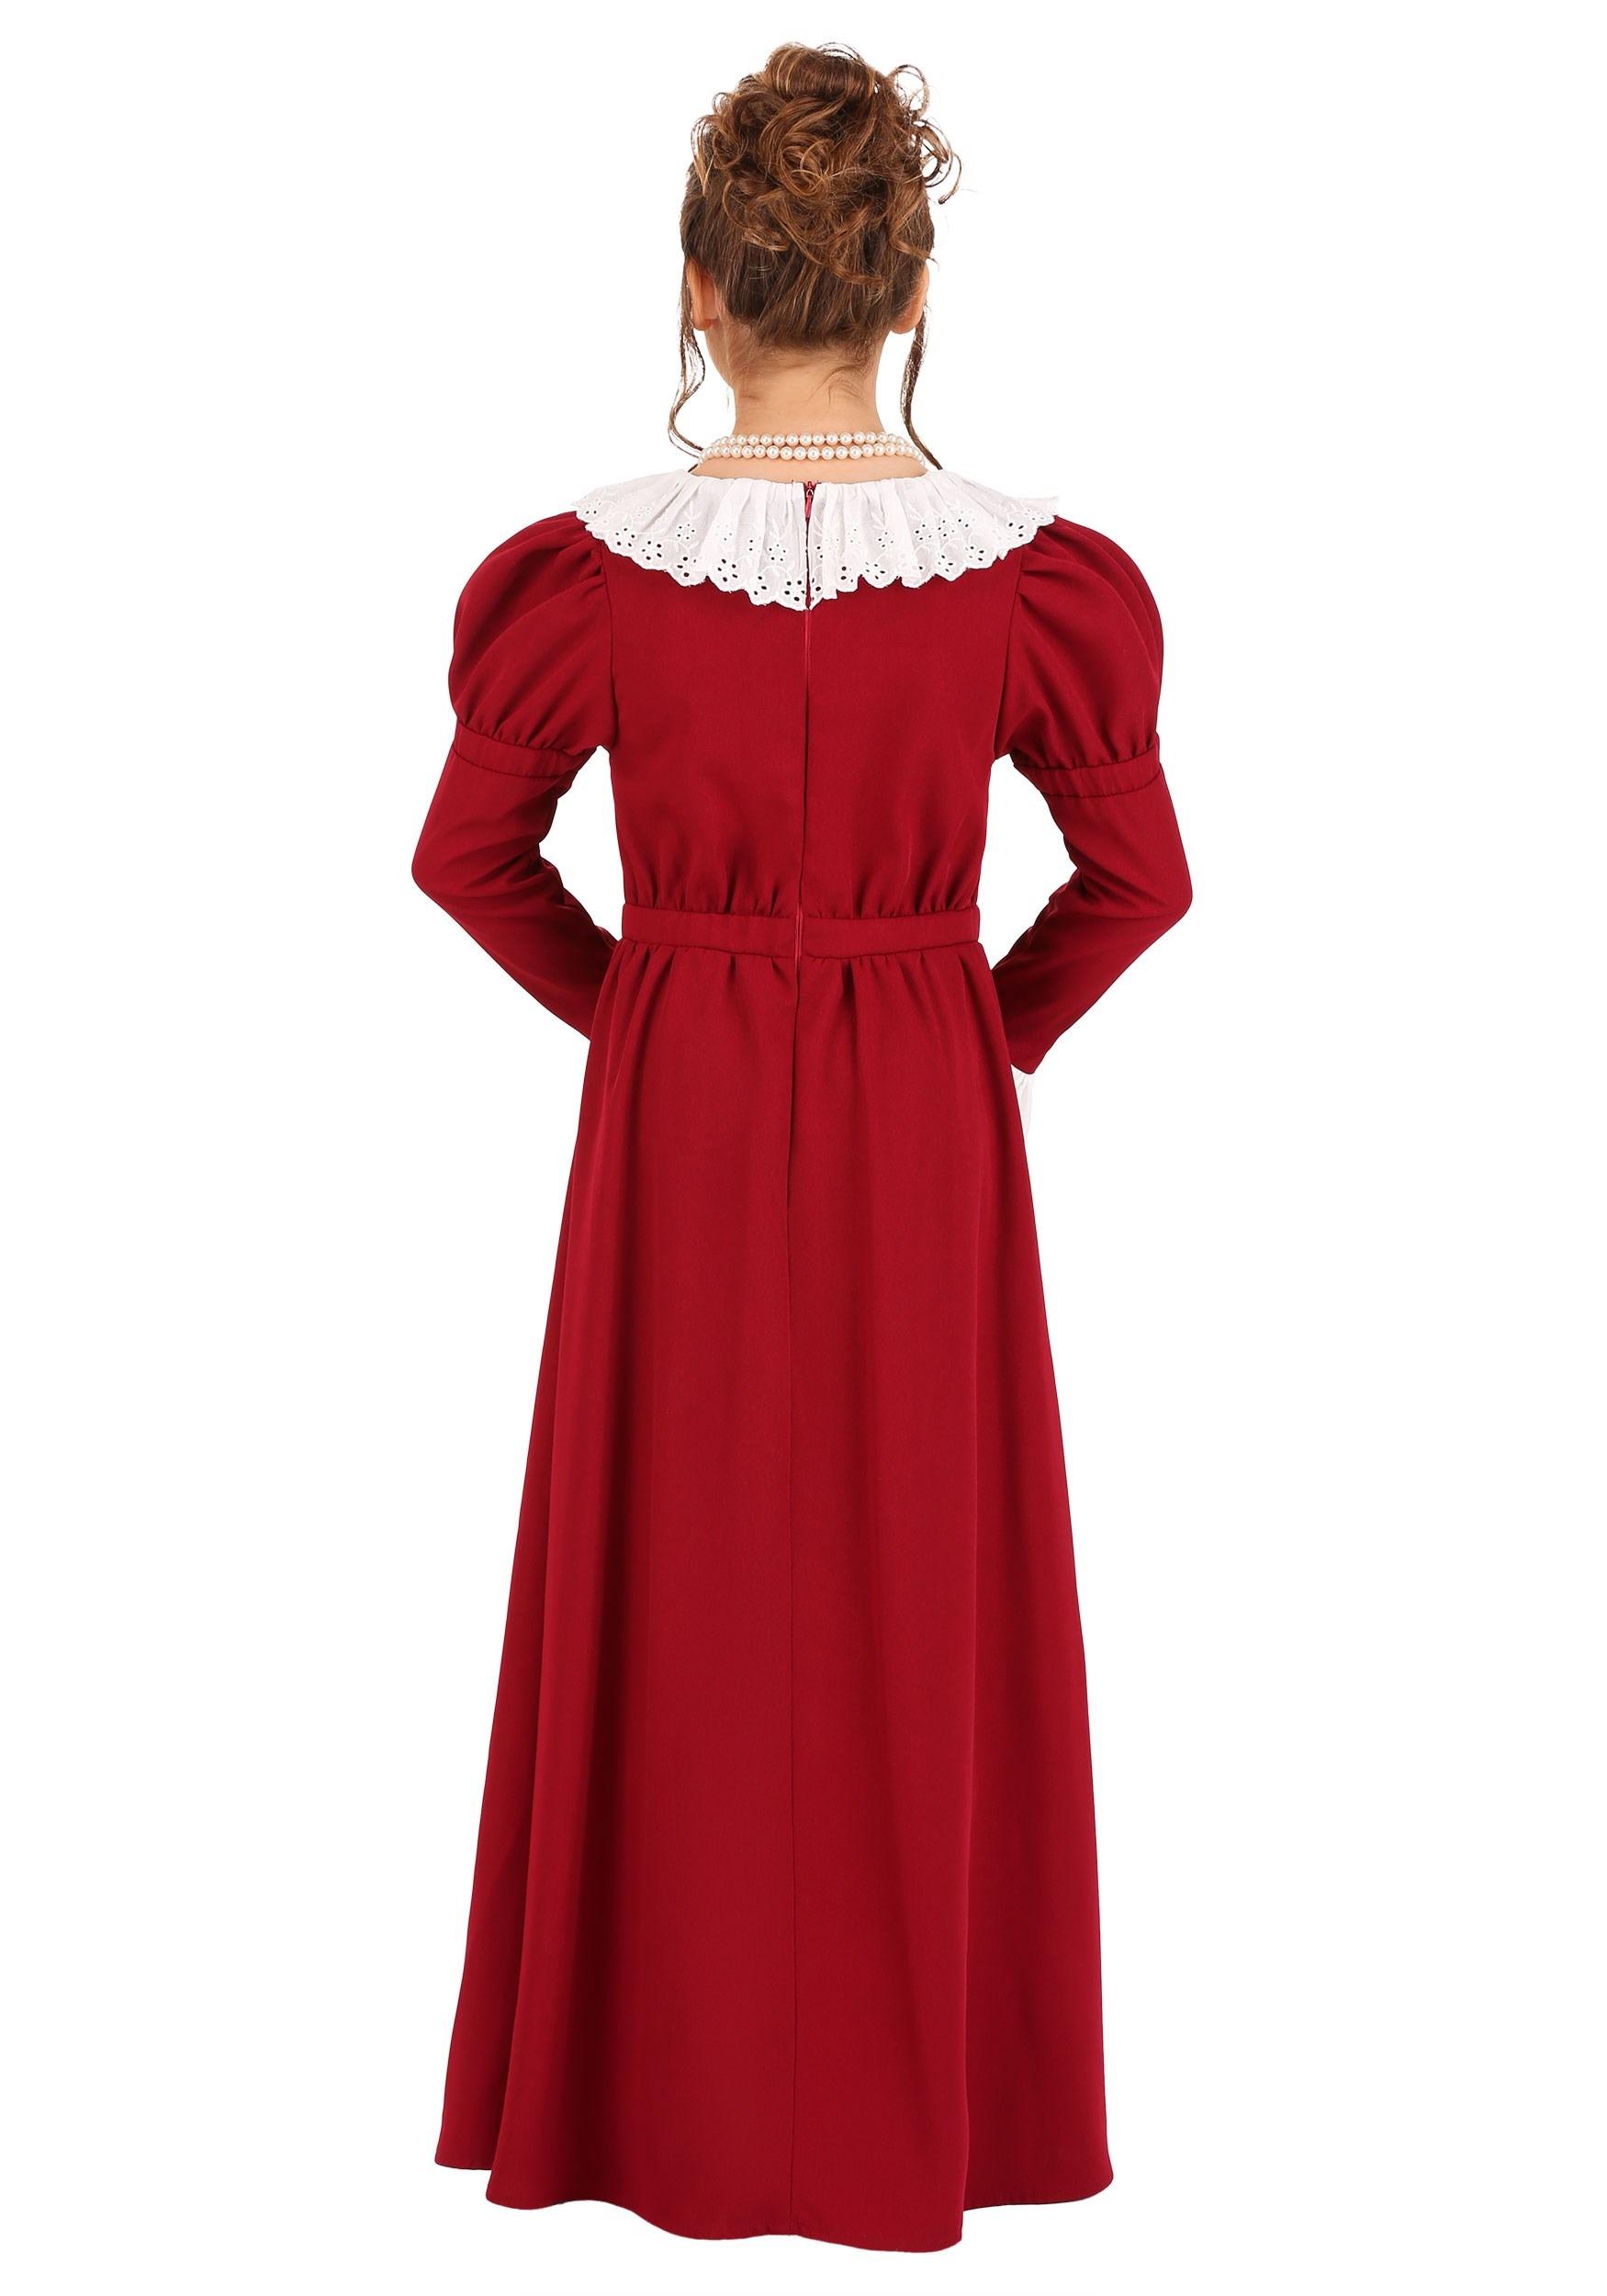 Abigail Adams Kid's Costume